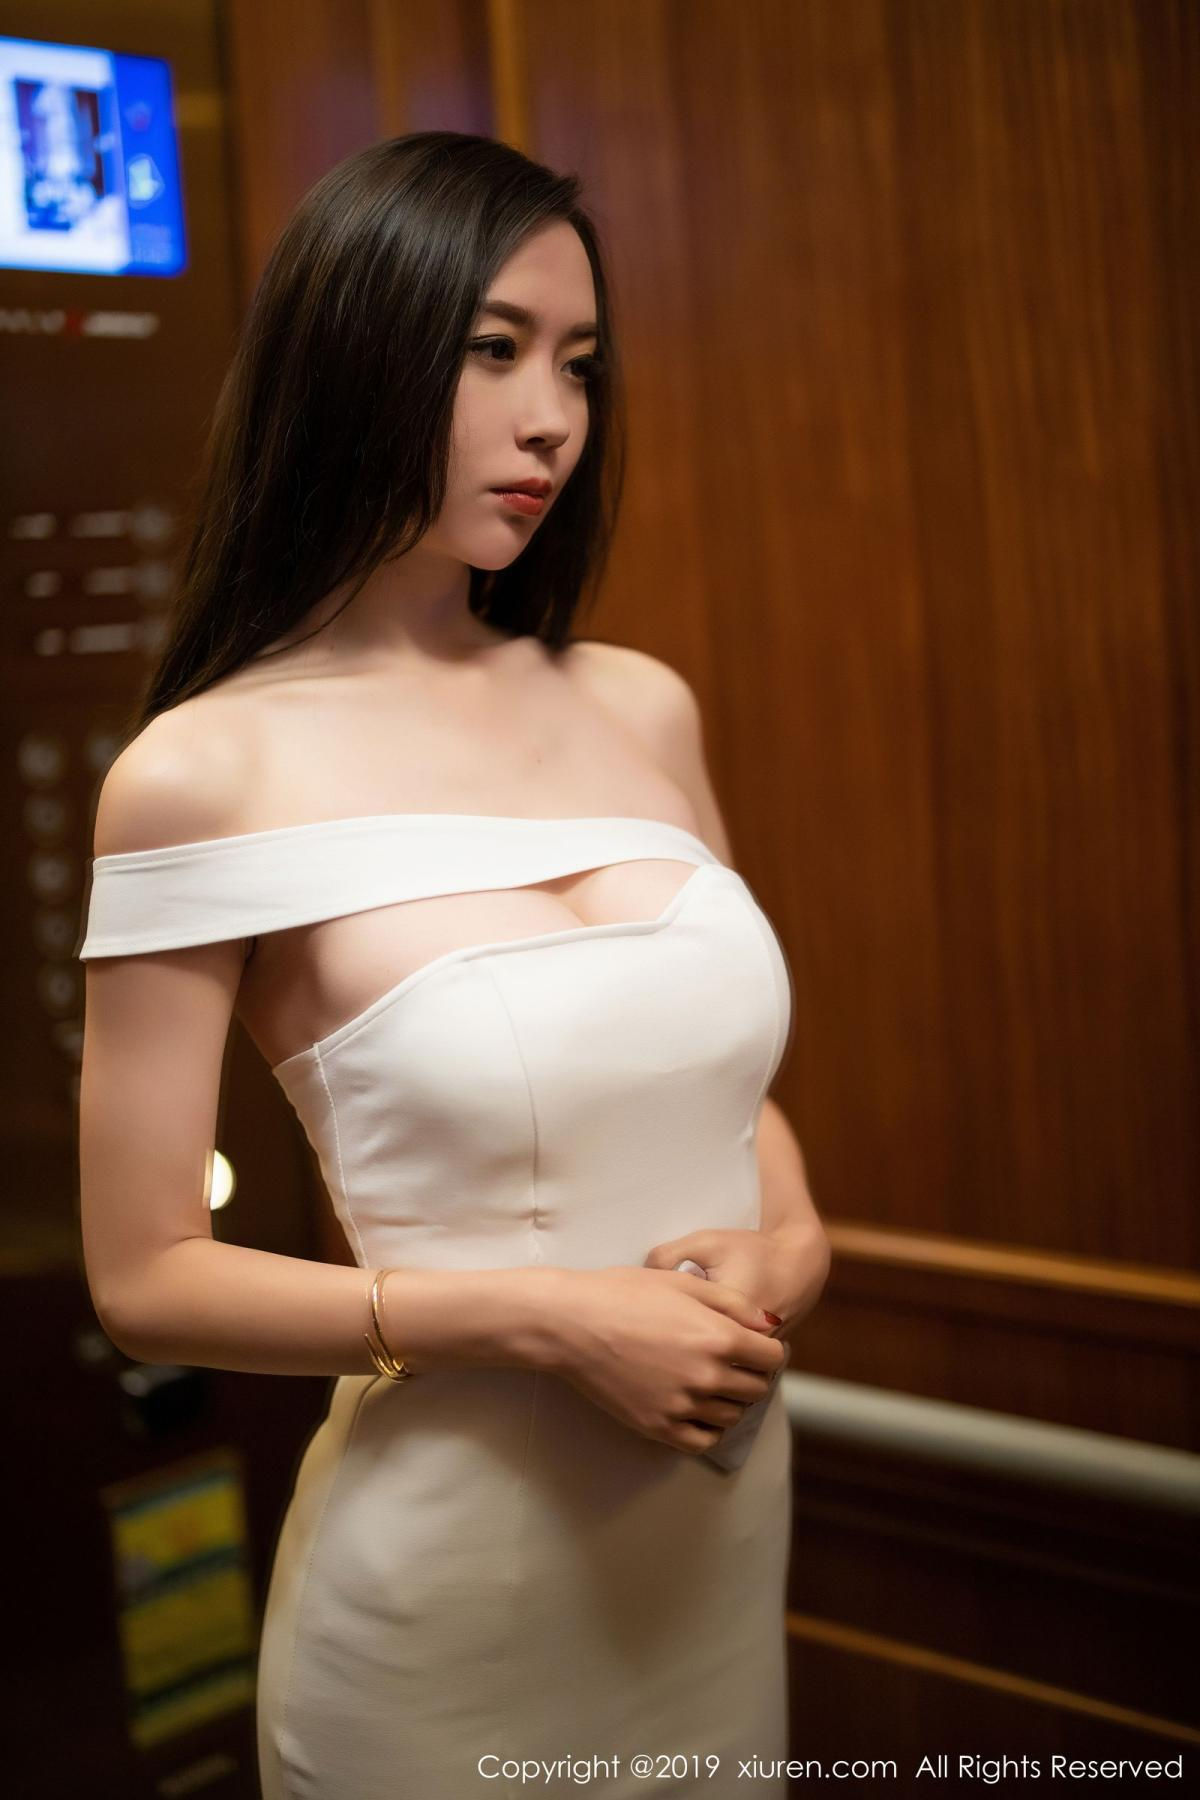 [XiuRen] Vol.1861 Meng Xin Yue 12P, Meng Xin Yue, Tall, Temperament, Uniform, Xiuren